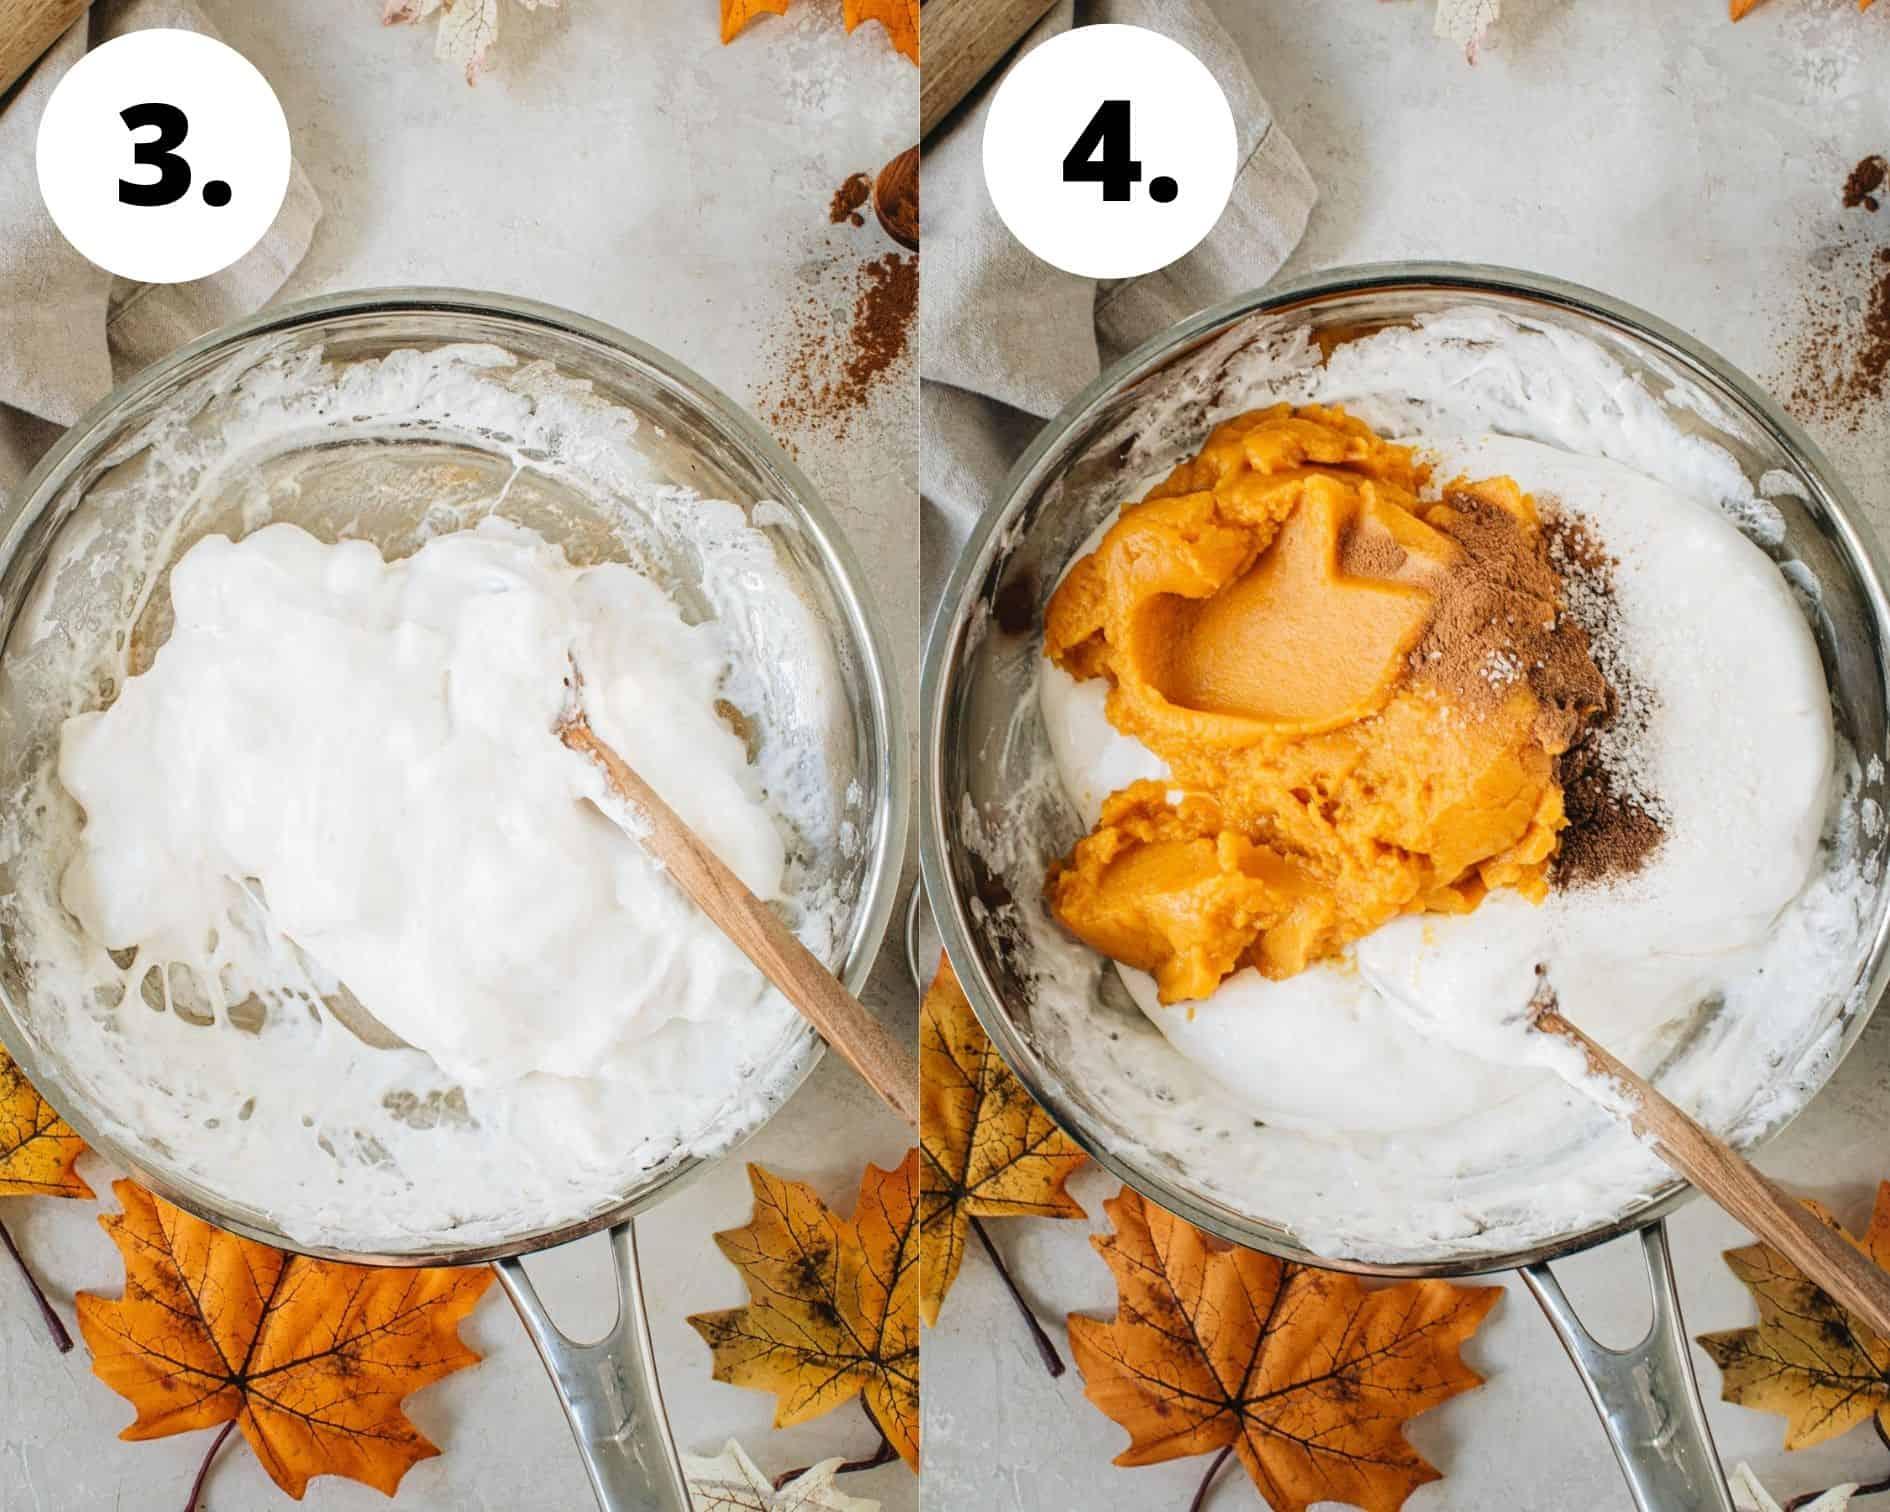 No-bake pumpkin pie process steps 3 and 4.